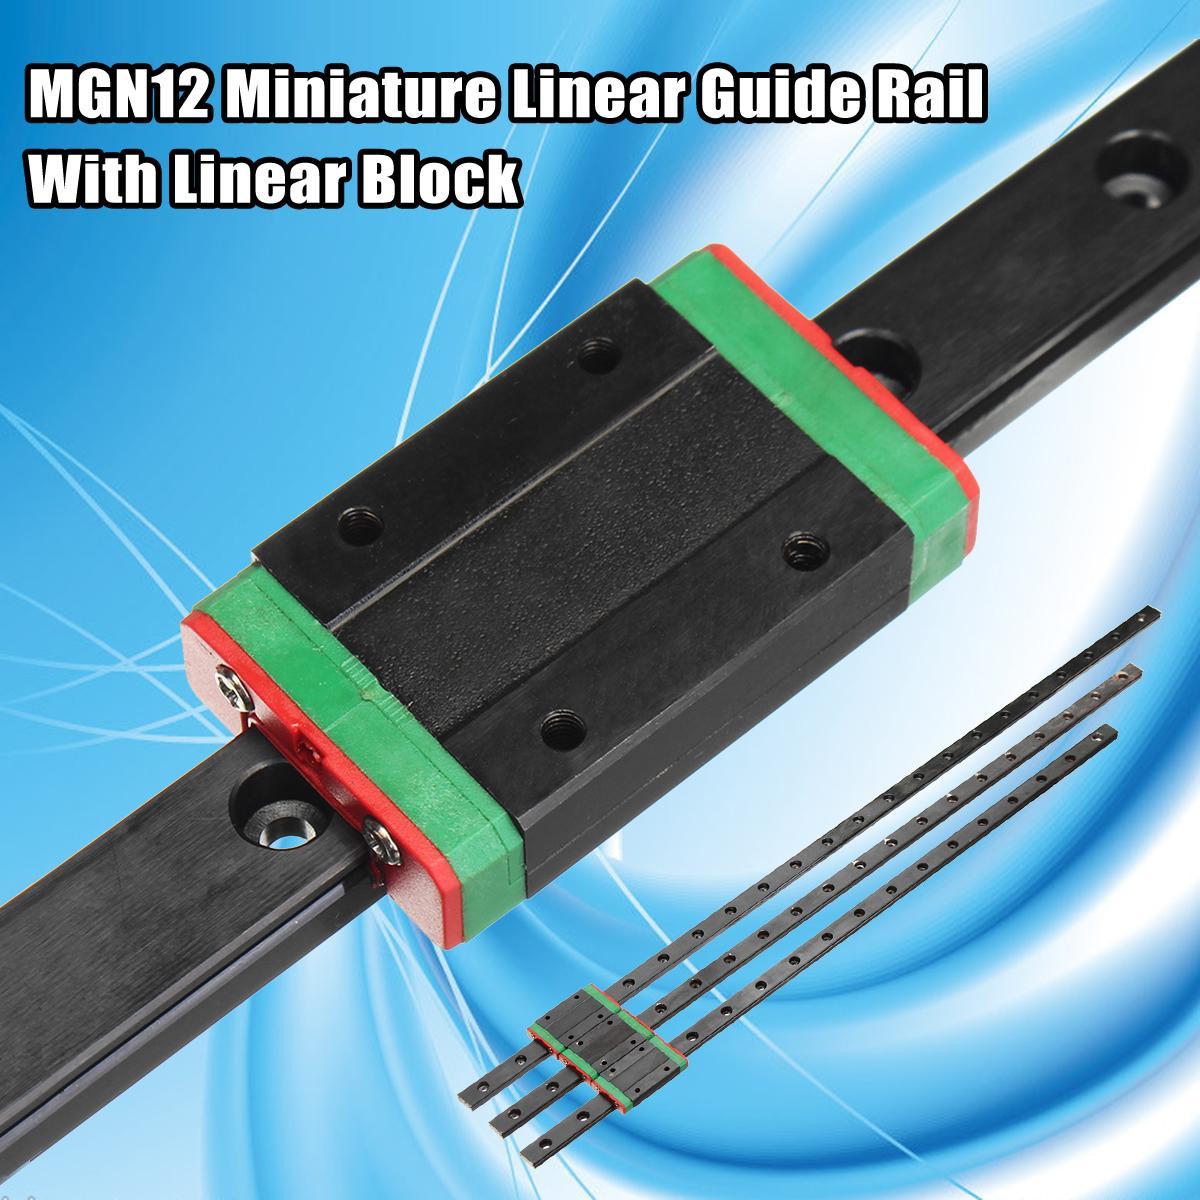 New High Quality 3D Printer Axis Parts Linear Rail Guide Slide MGN12 450mm/500mm/550mm + Mini MGN12H Linear Block Black roland sj 640 xj 640 l bearing rail block ssr15xw2ge 2560ly 21895161 printer parts